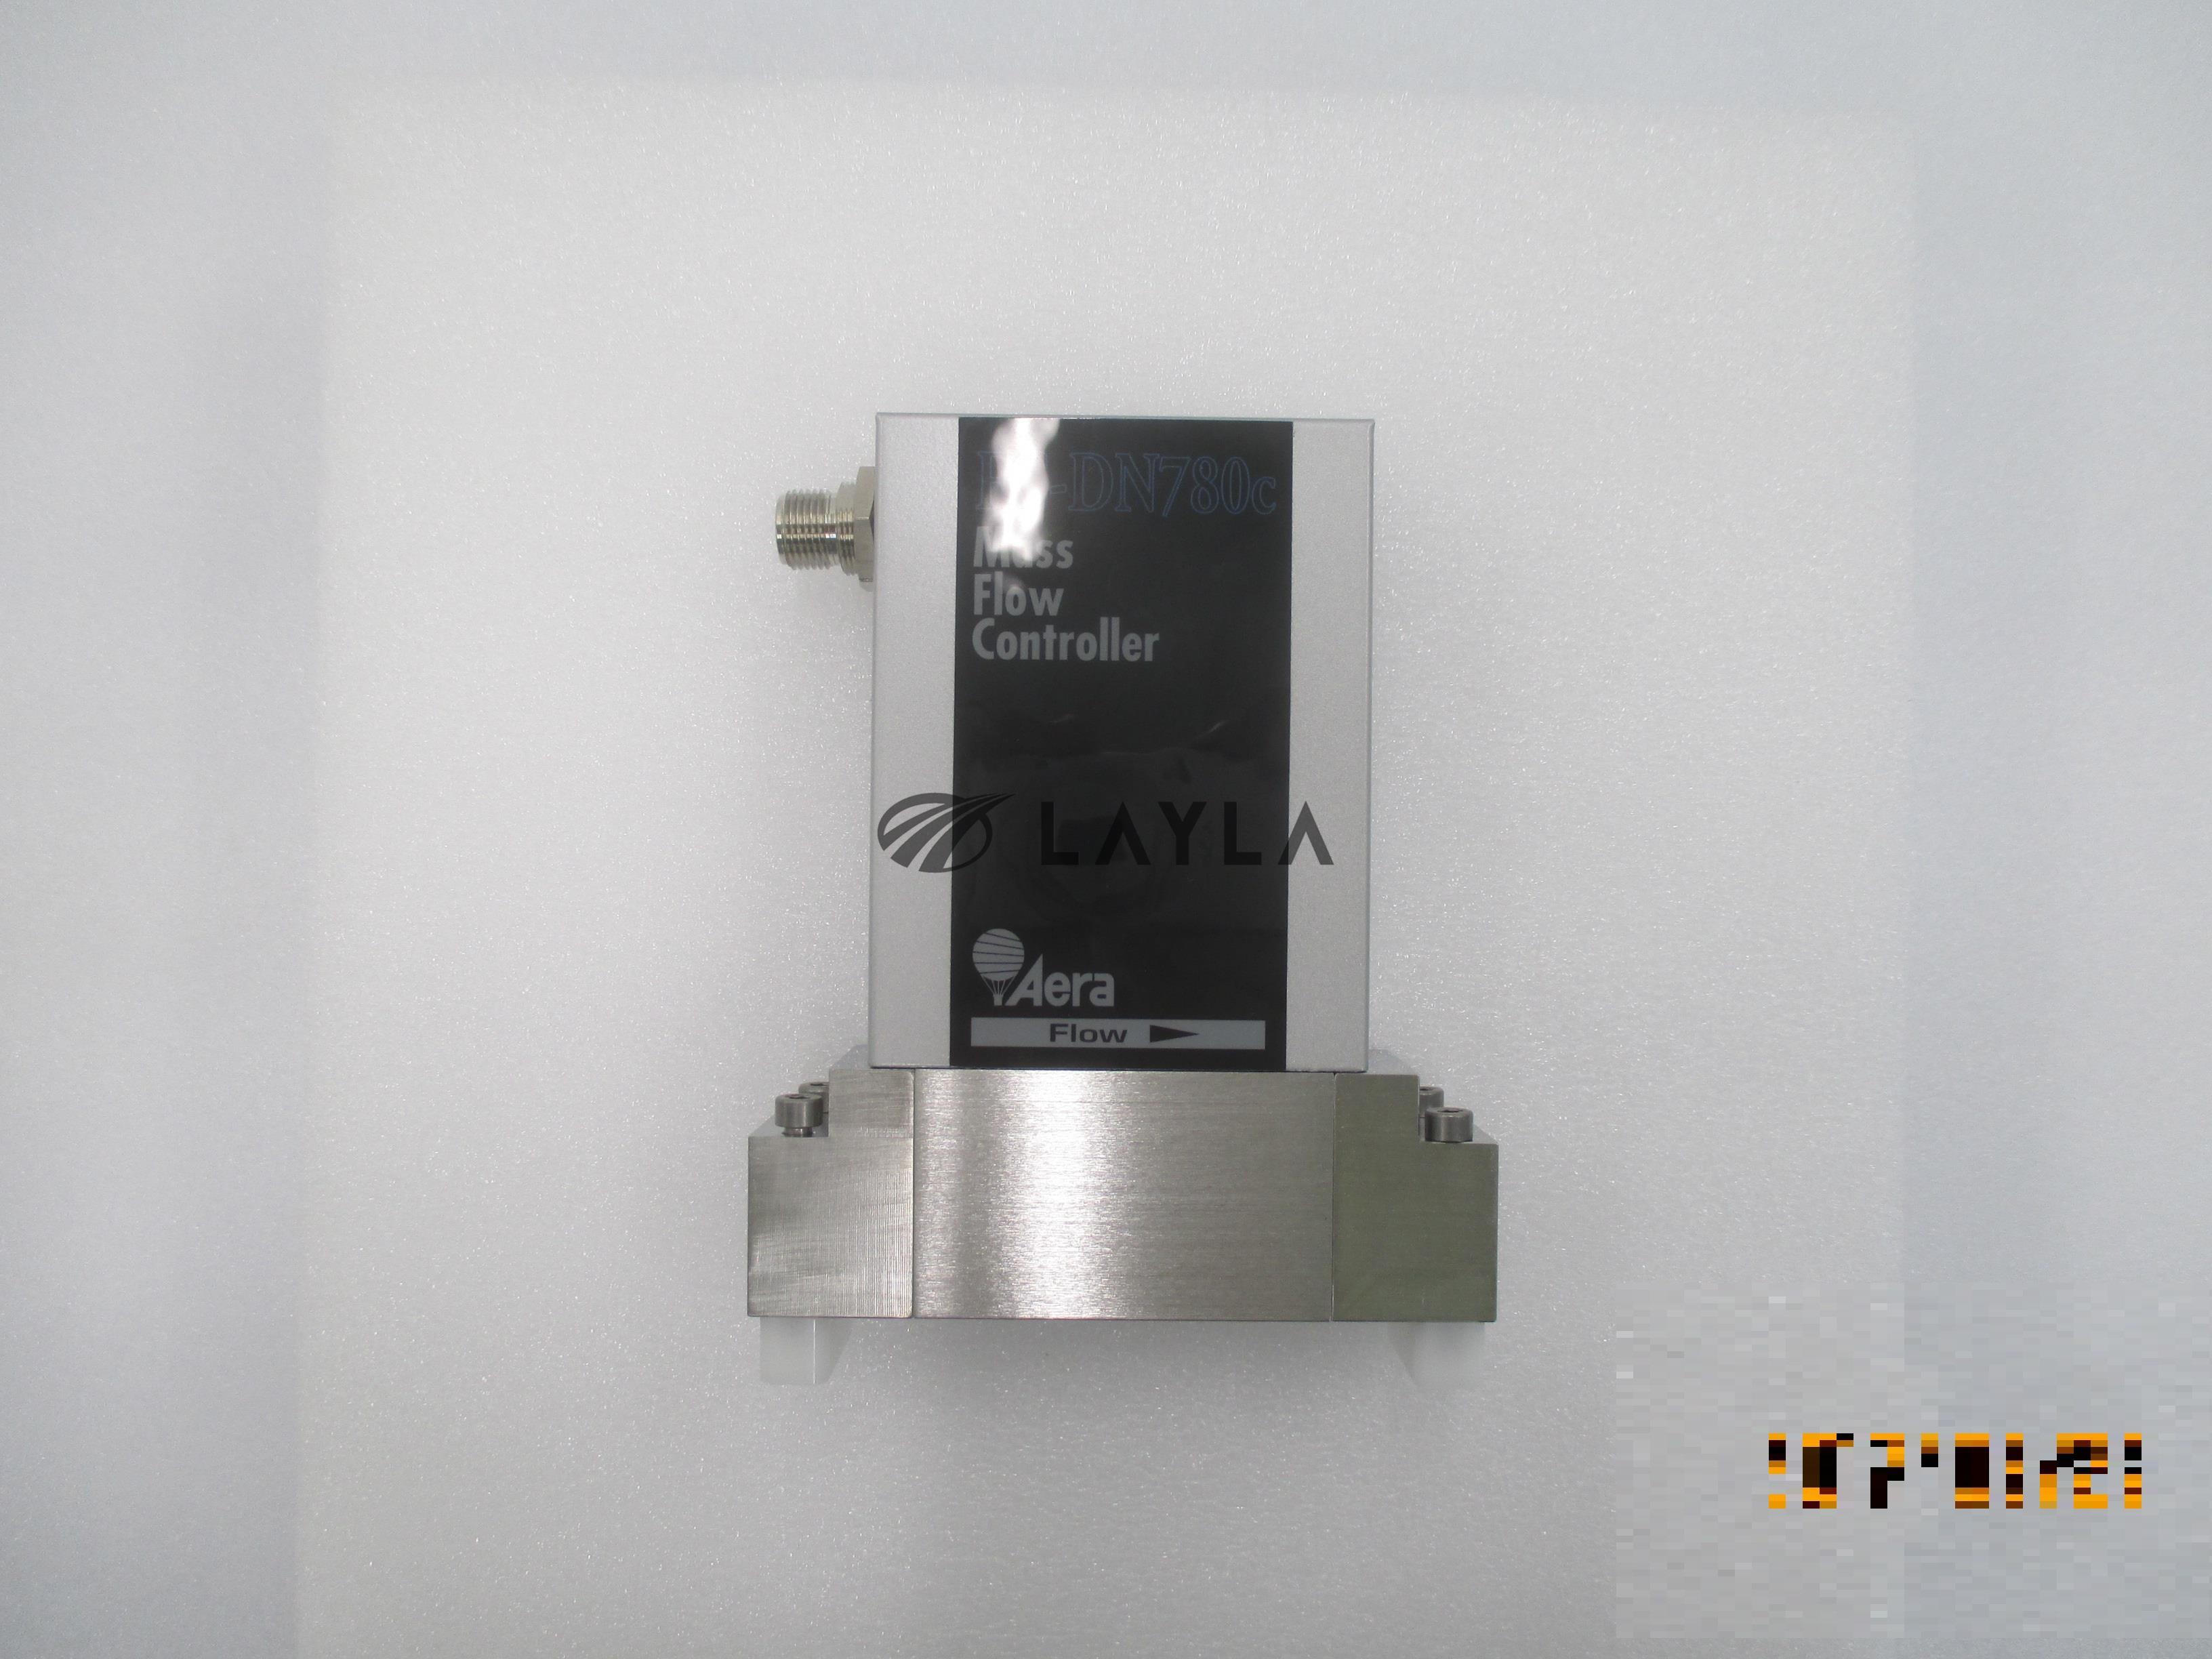 FC-DN-780C-BANF3400SCCM//MFC FC-DN-780C-BA NF3 400SCCM//_02